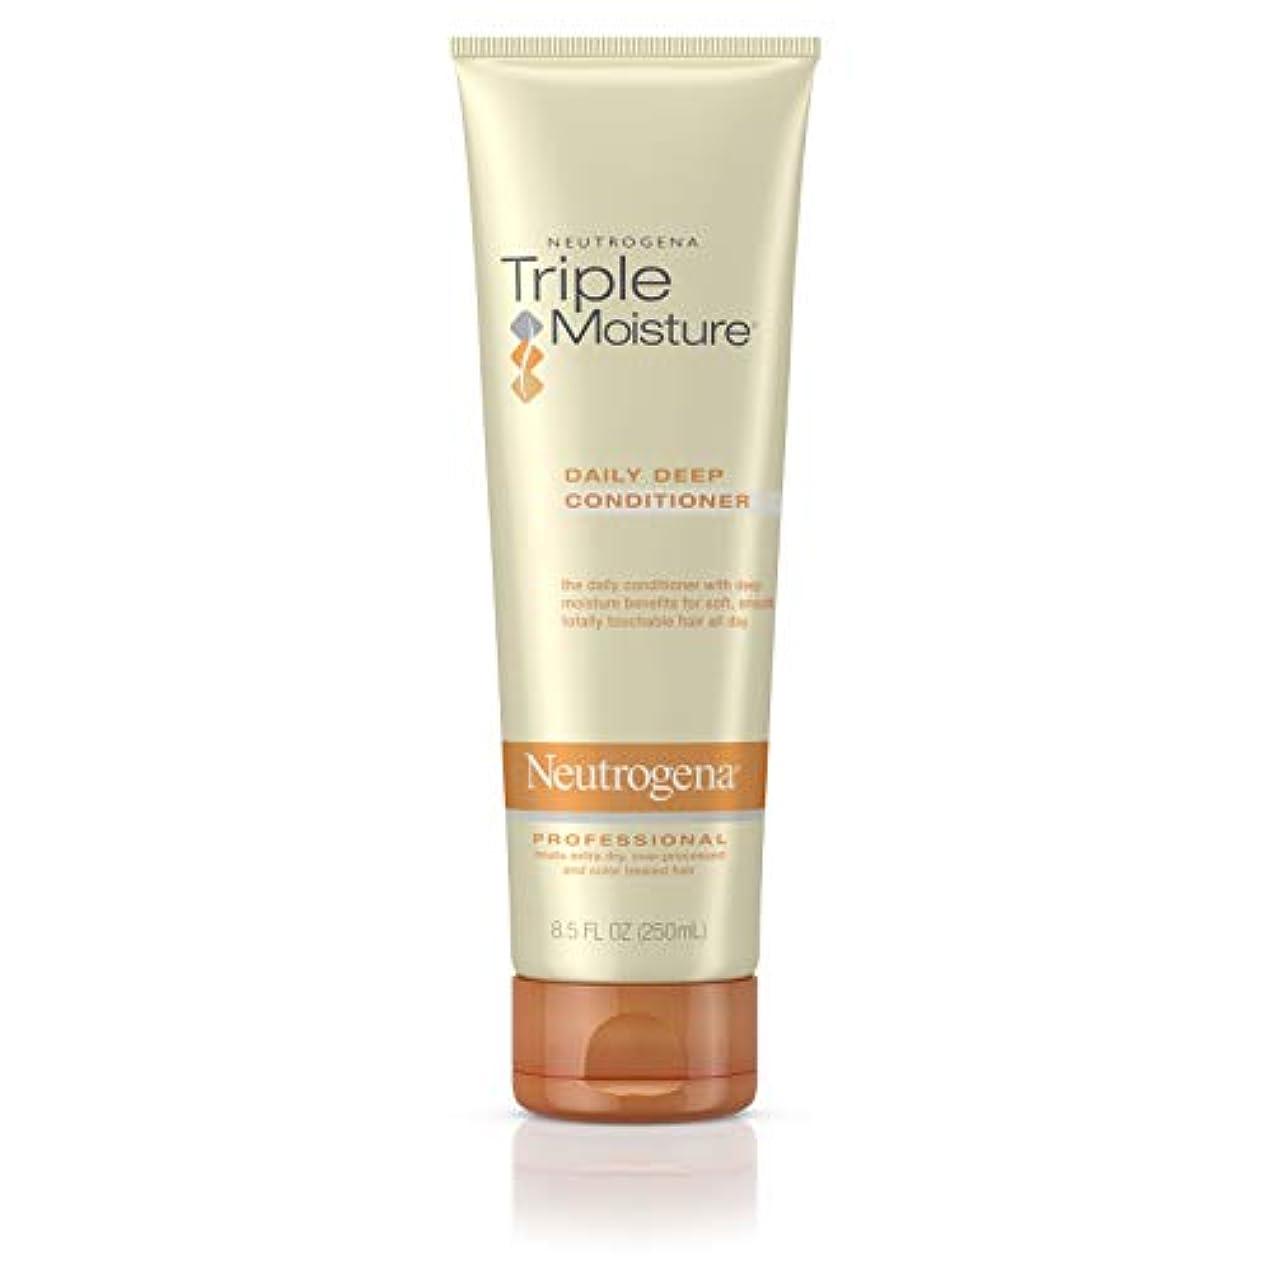 広告主商品意図Neutrogena Triple Moisture Daily Deep Conditioner 250 ml (並行輸入品)